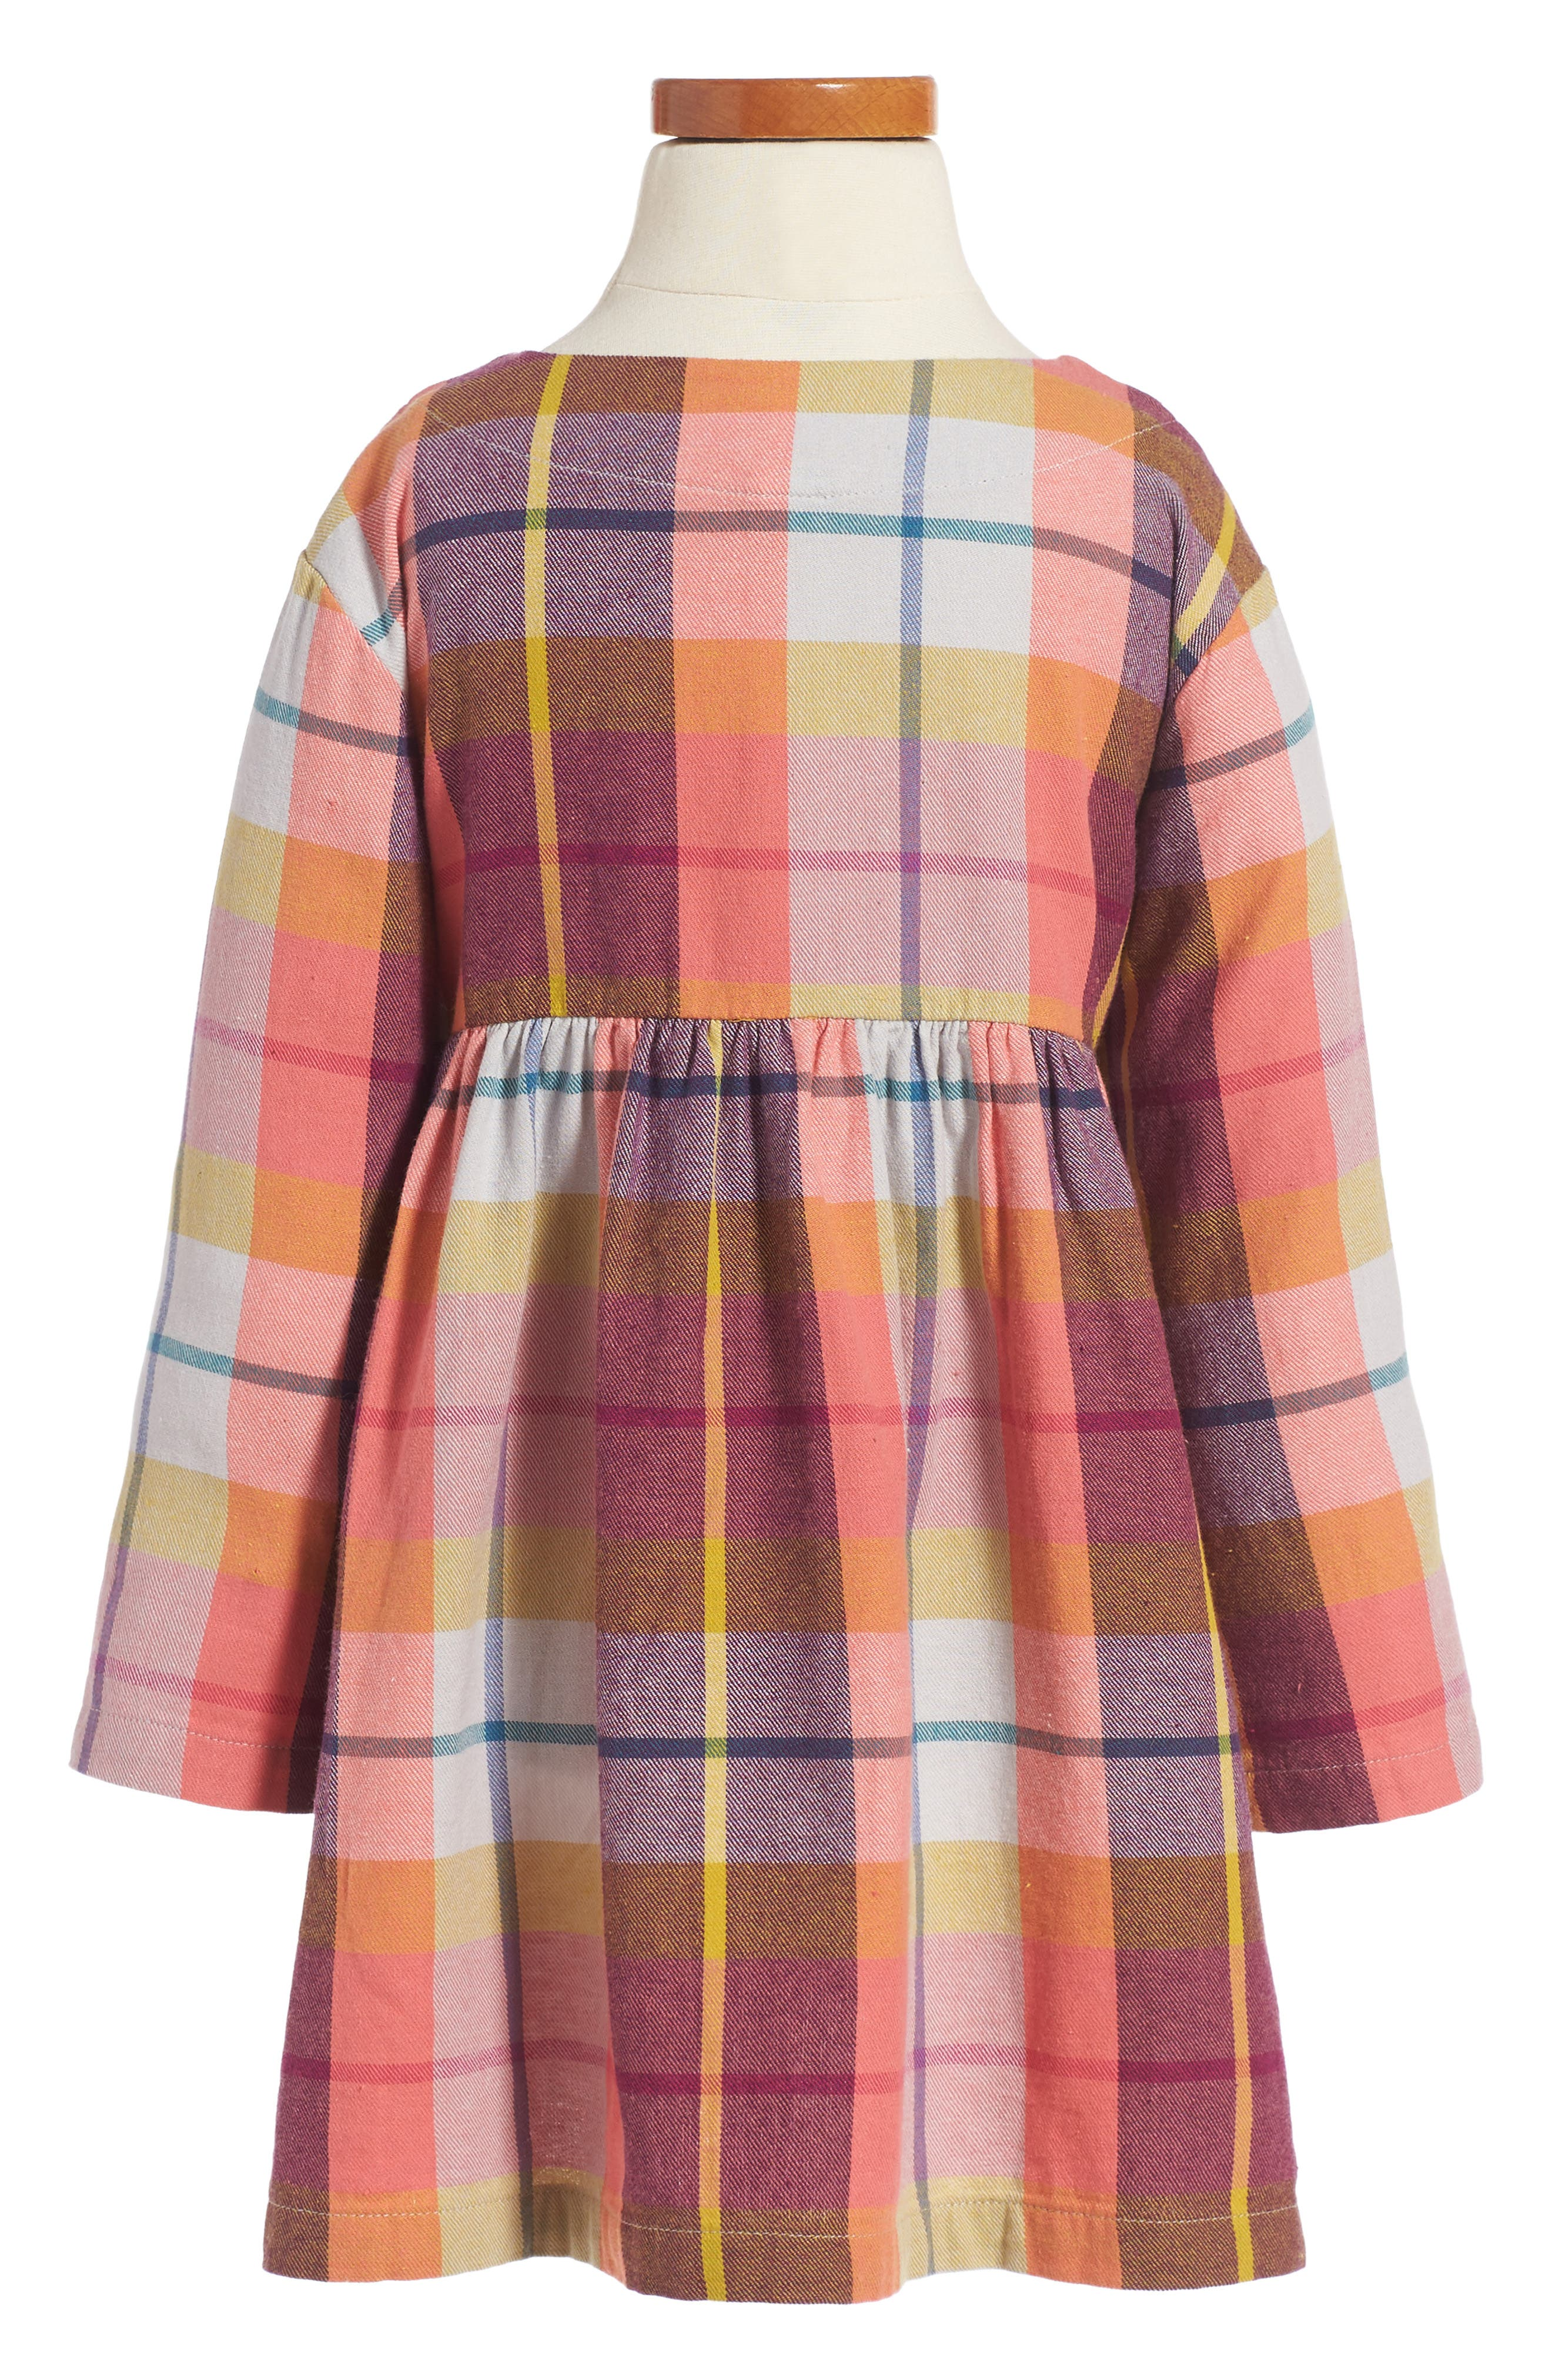 Alternate Image 2  - Tea Collection Plaid Flannel Dress (Toddler Girls & Little Girls)